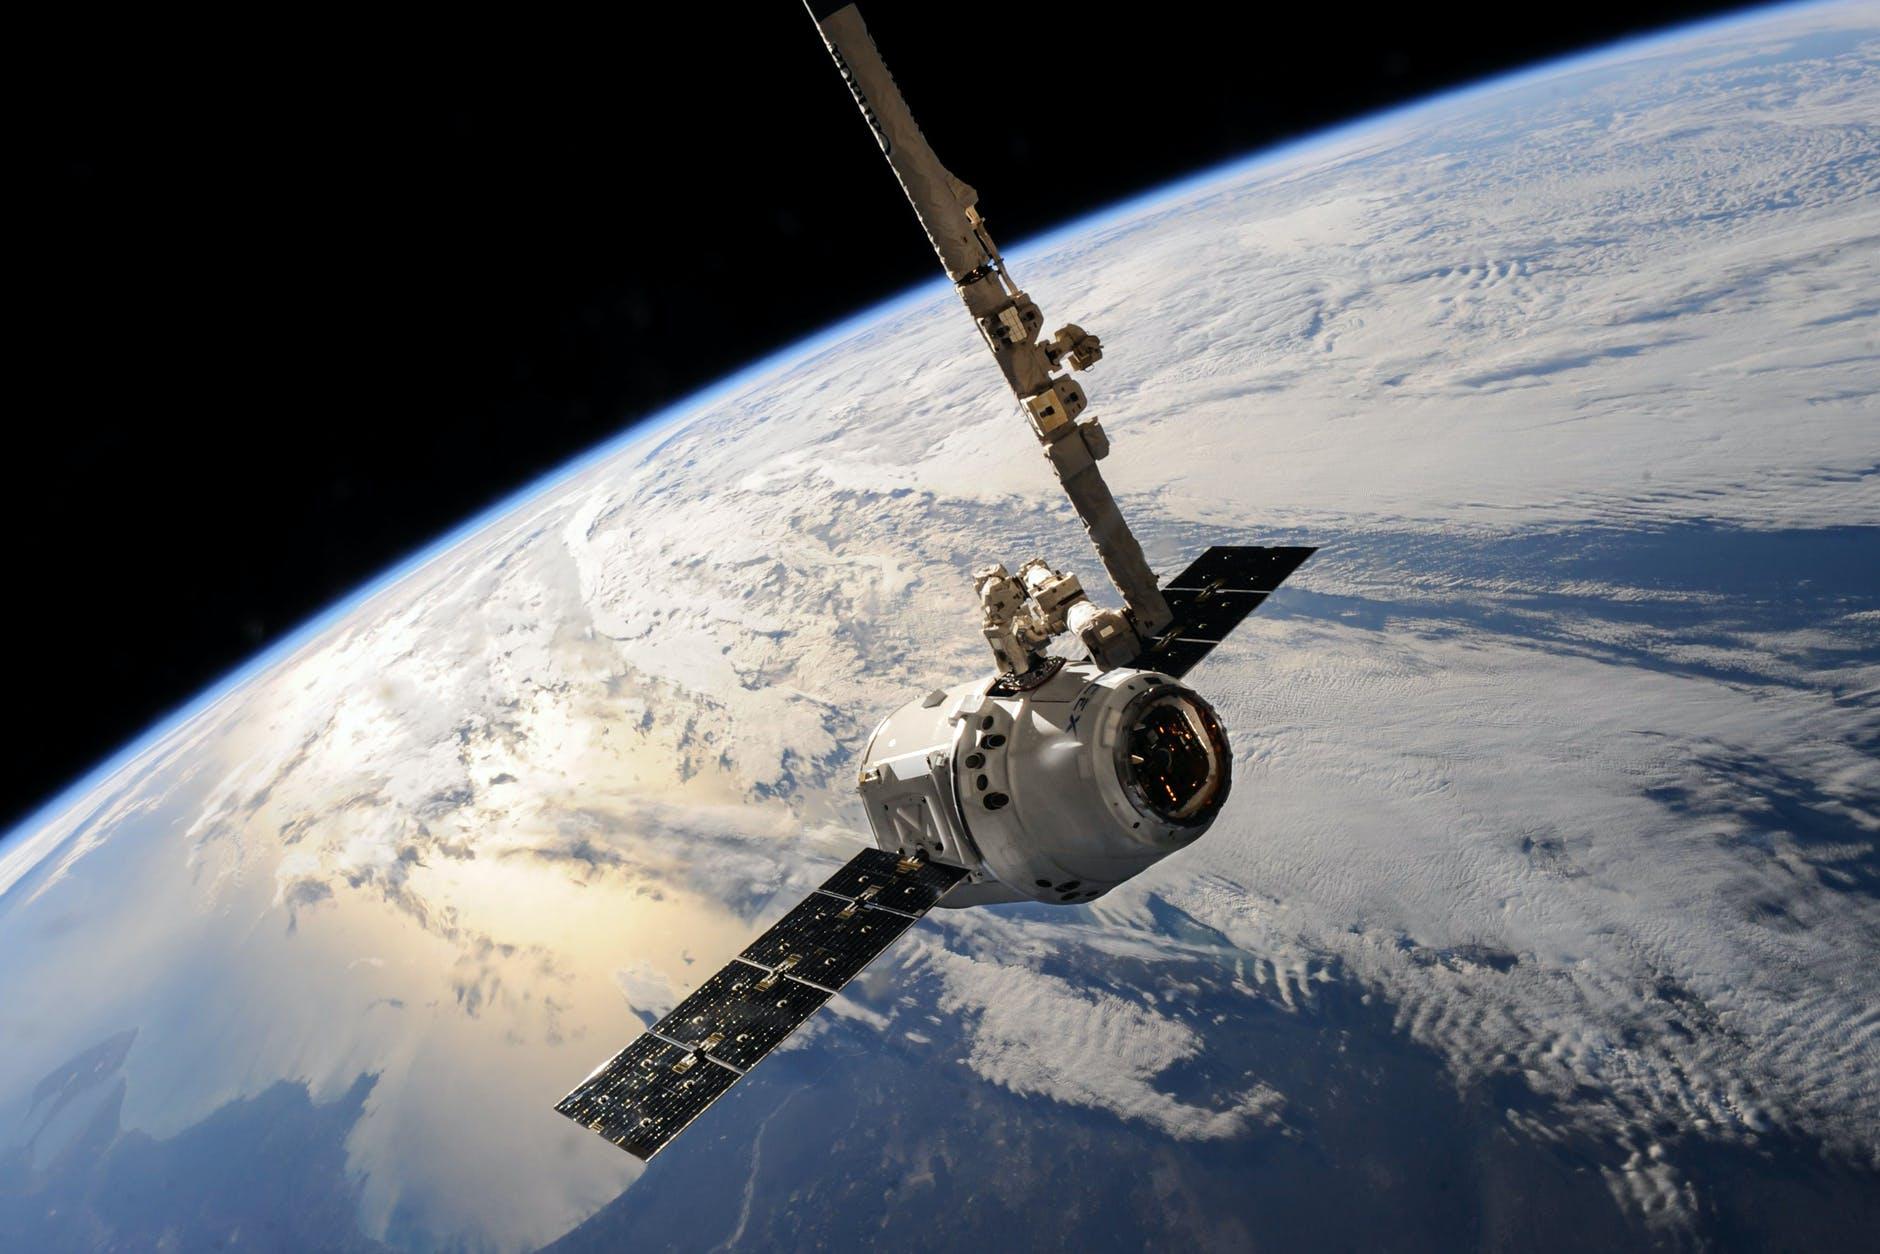 Daftar Satelit Parabola Terbaru